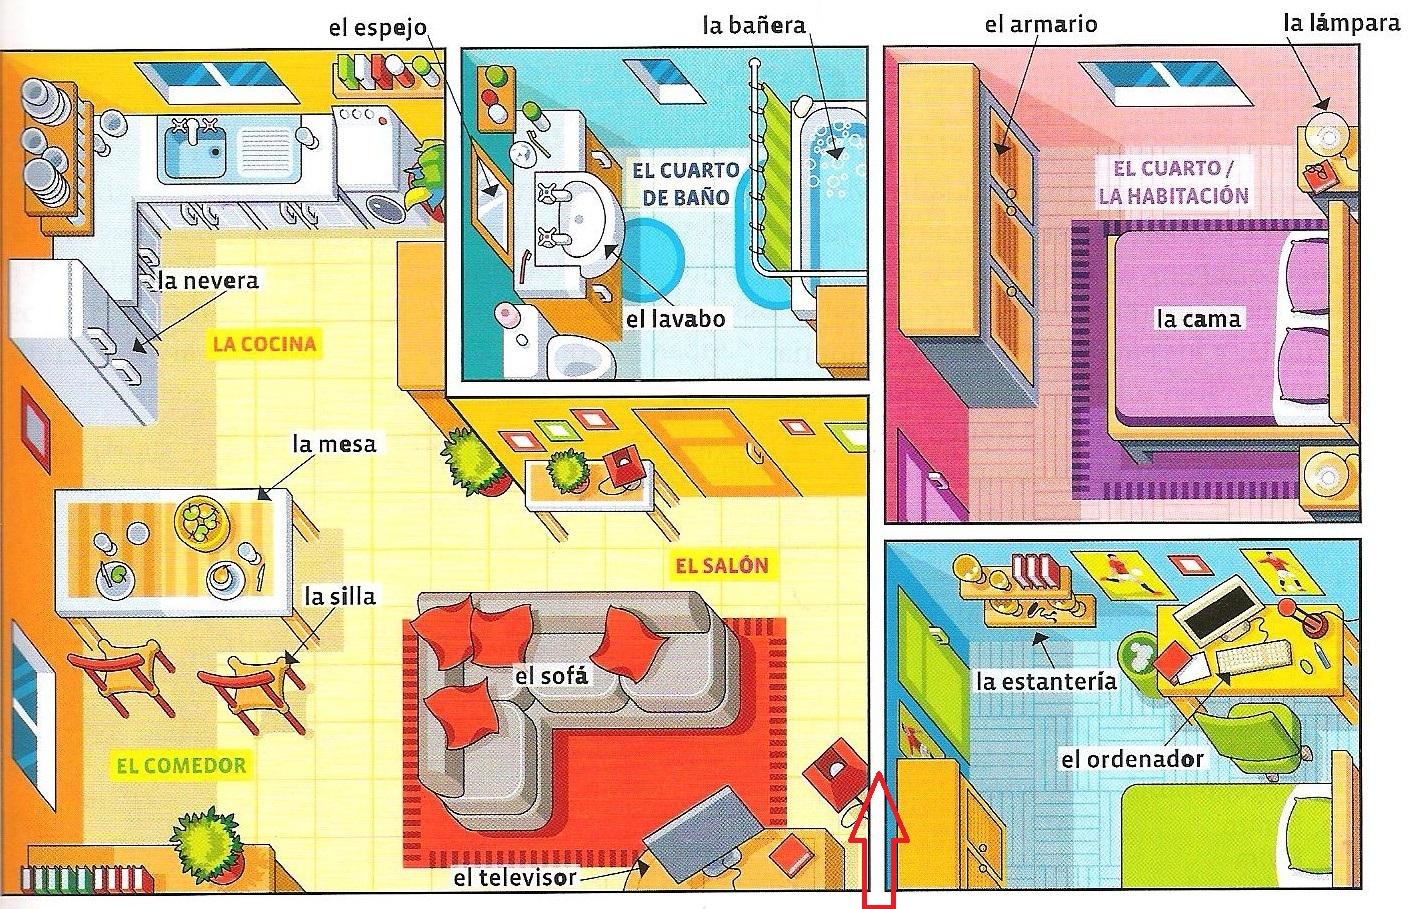 Plano de casa en la sombra de la profesora de espa ol - Plano de la casa ...